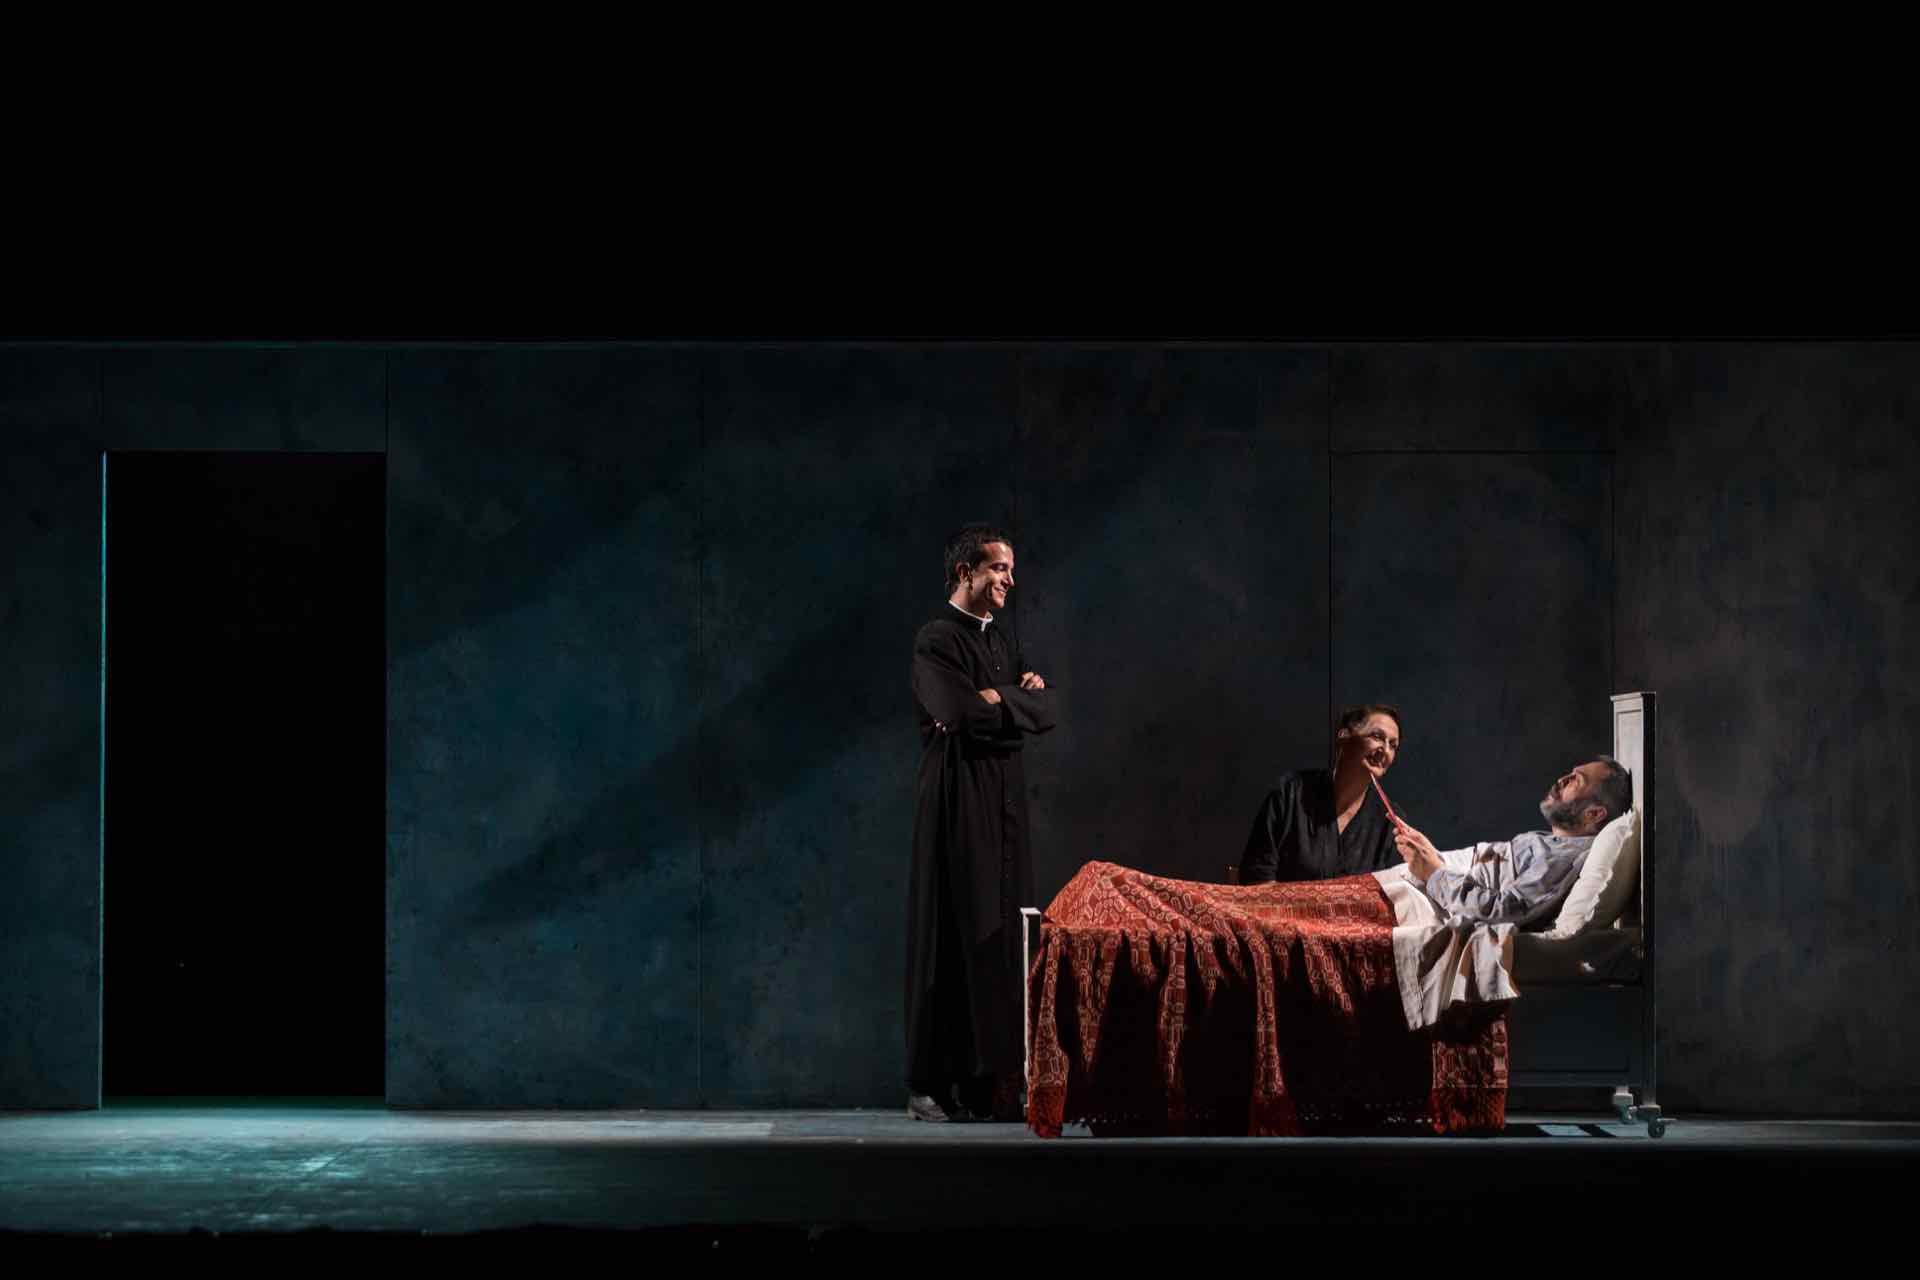 Vangelo secondo Lorenzo - regia Leo Muscato - ph Ilaria Costanzo